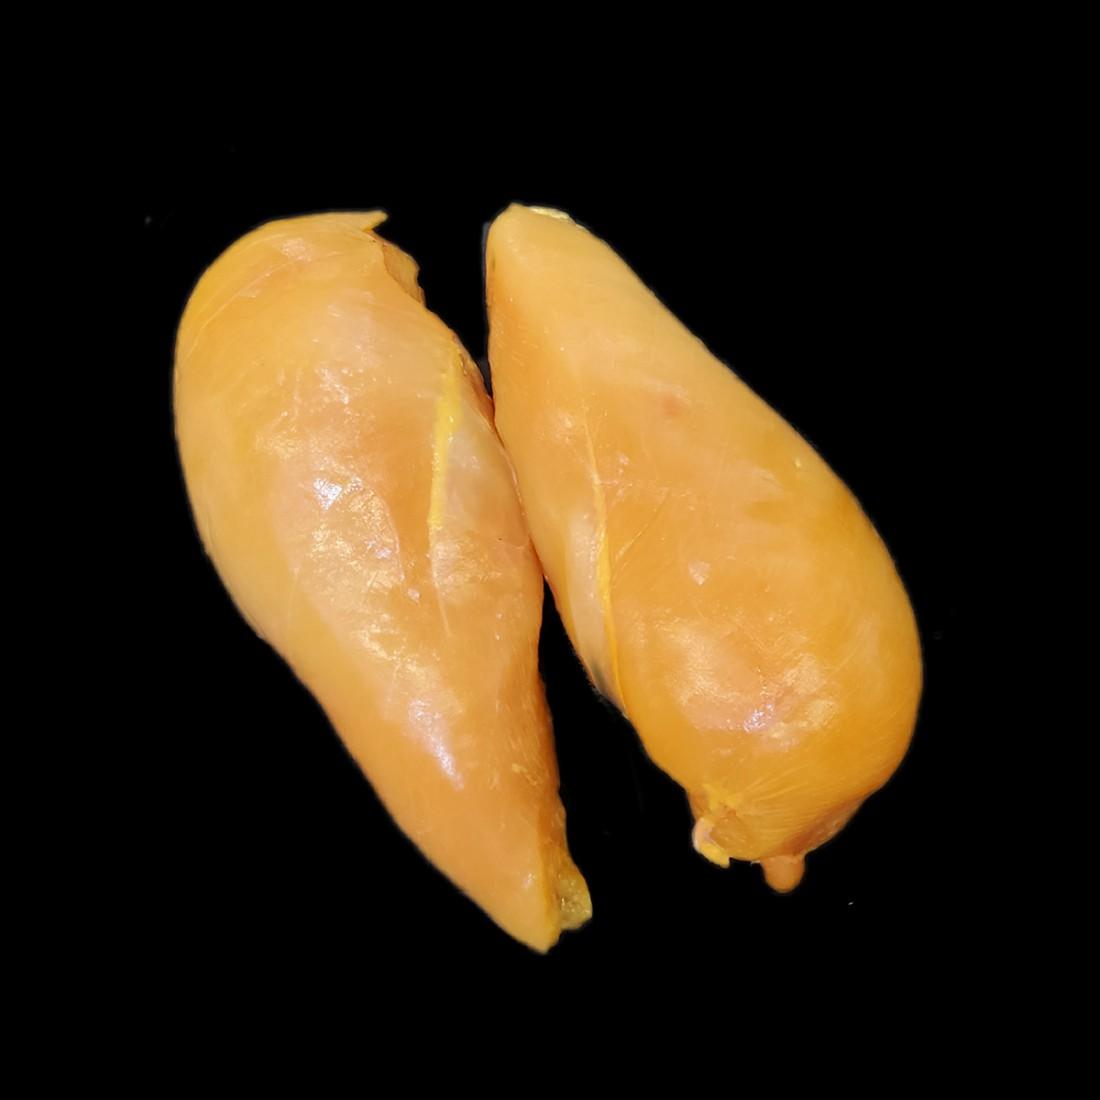 Chuletón de ternera hembra - Pieza de 700 grs aprox